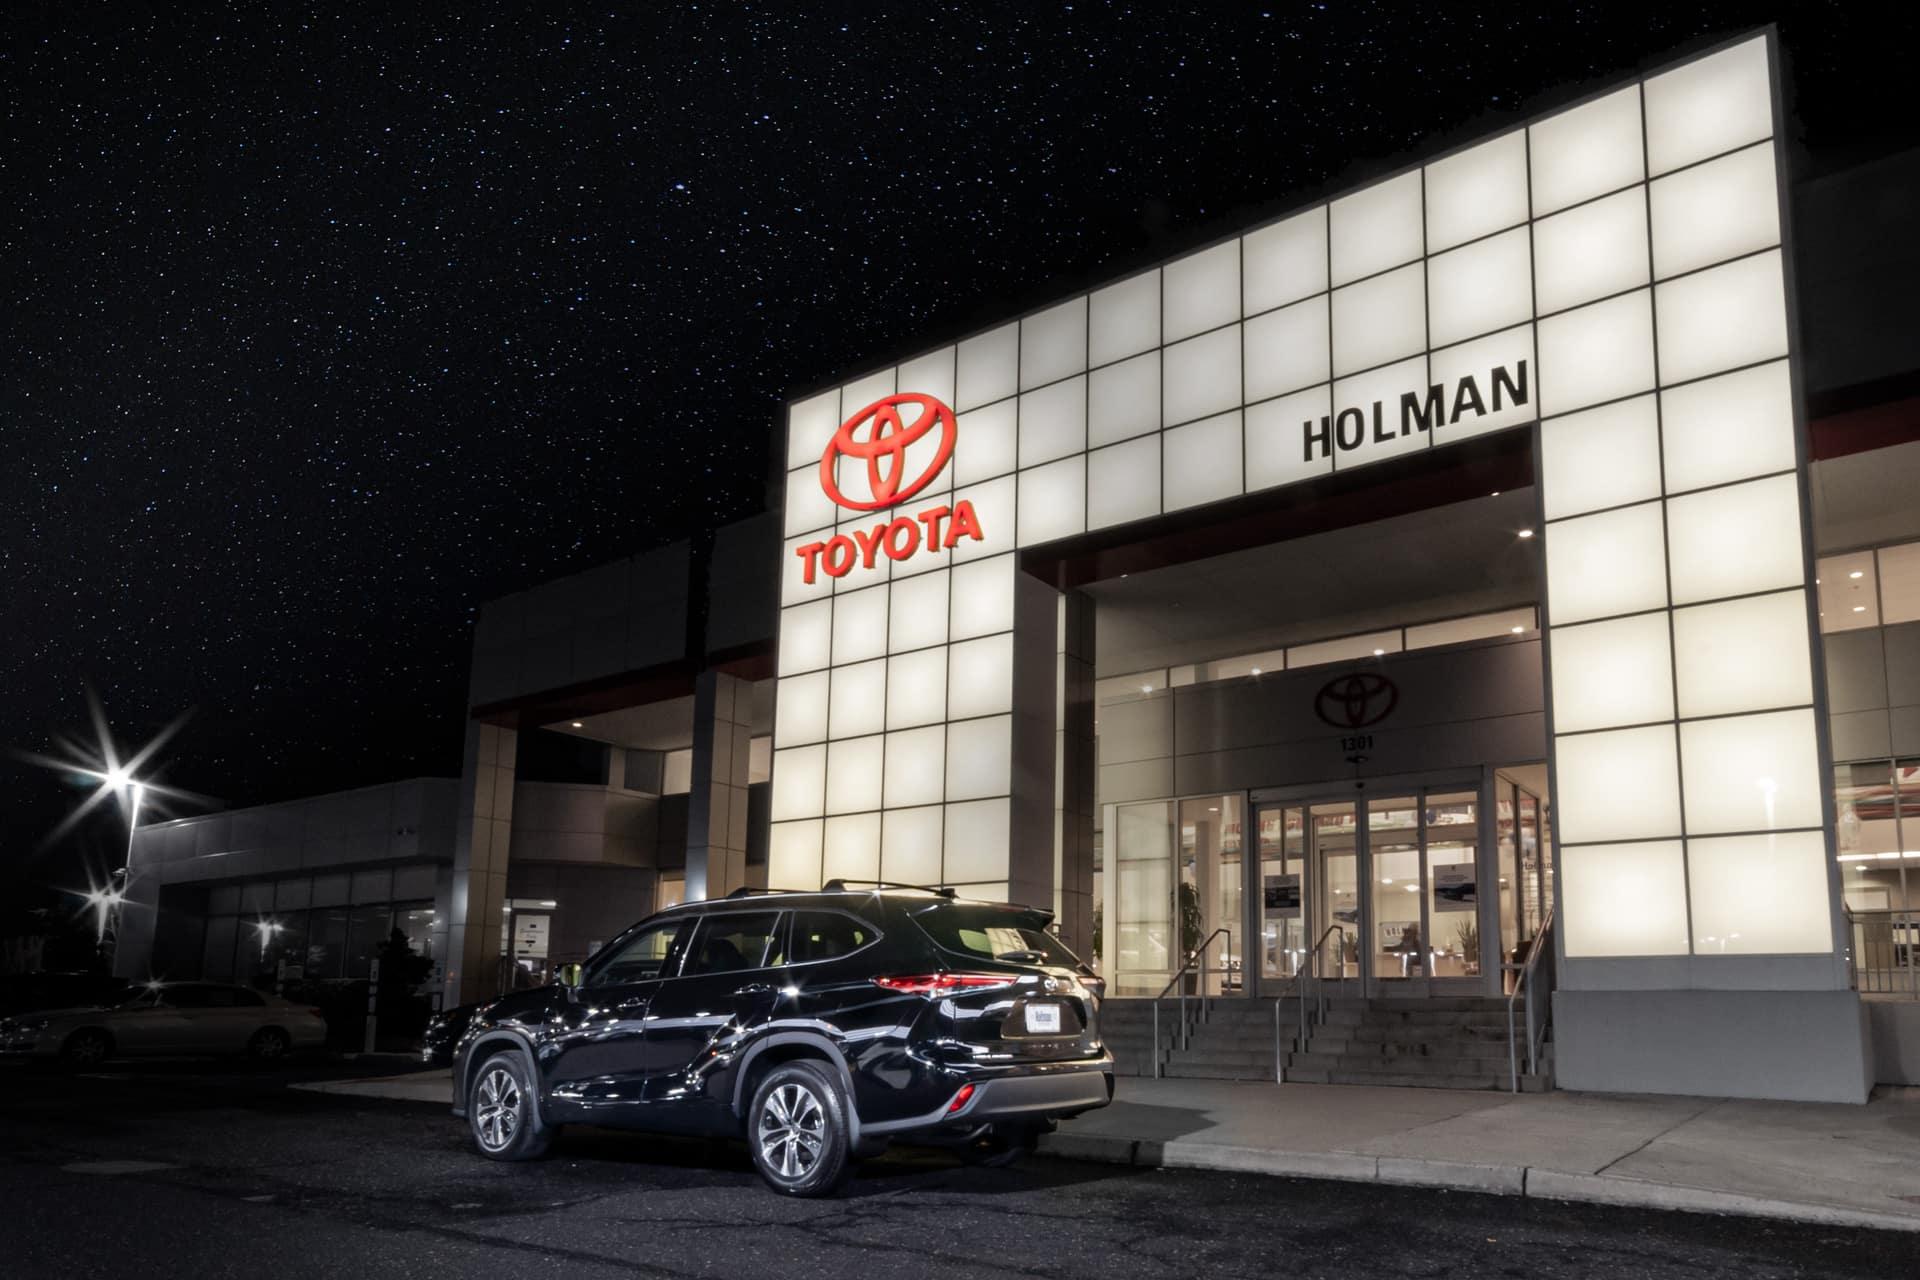 2020 Toyota Highlander outside of Holman Toyota dealership